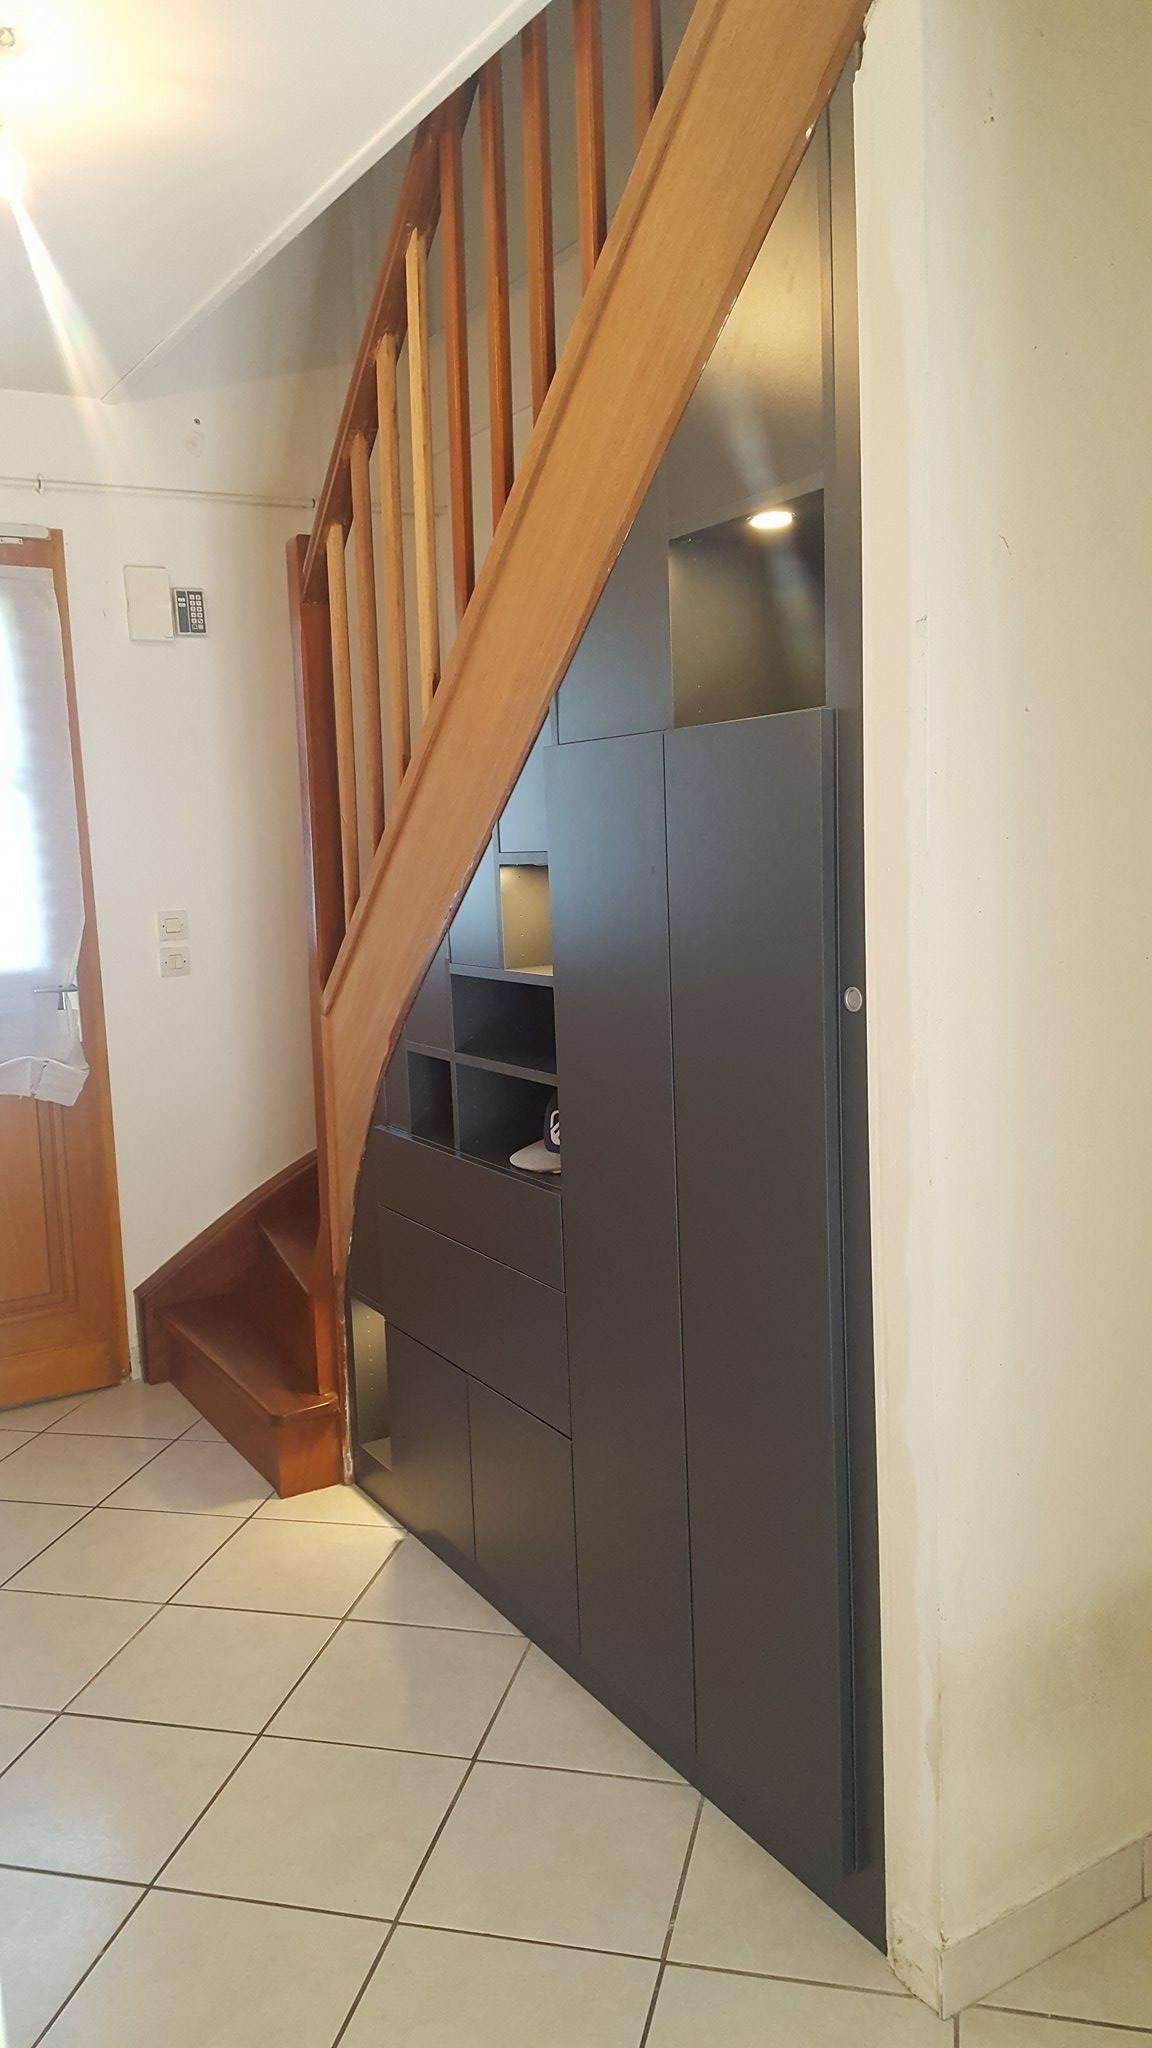 escalier avec rangement intgr great agencement sous pente et sous escalier with escalier avec. Black Bedroom Furniture Sets. Home Design Ideas